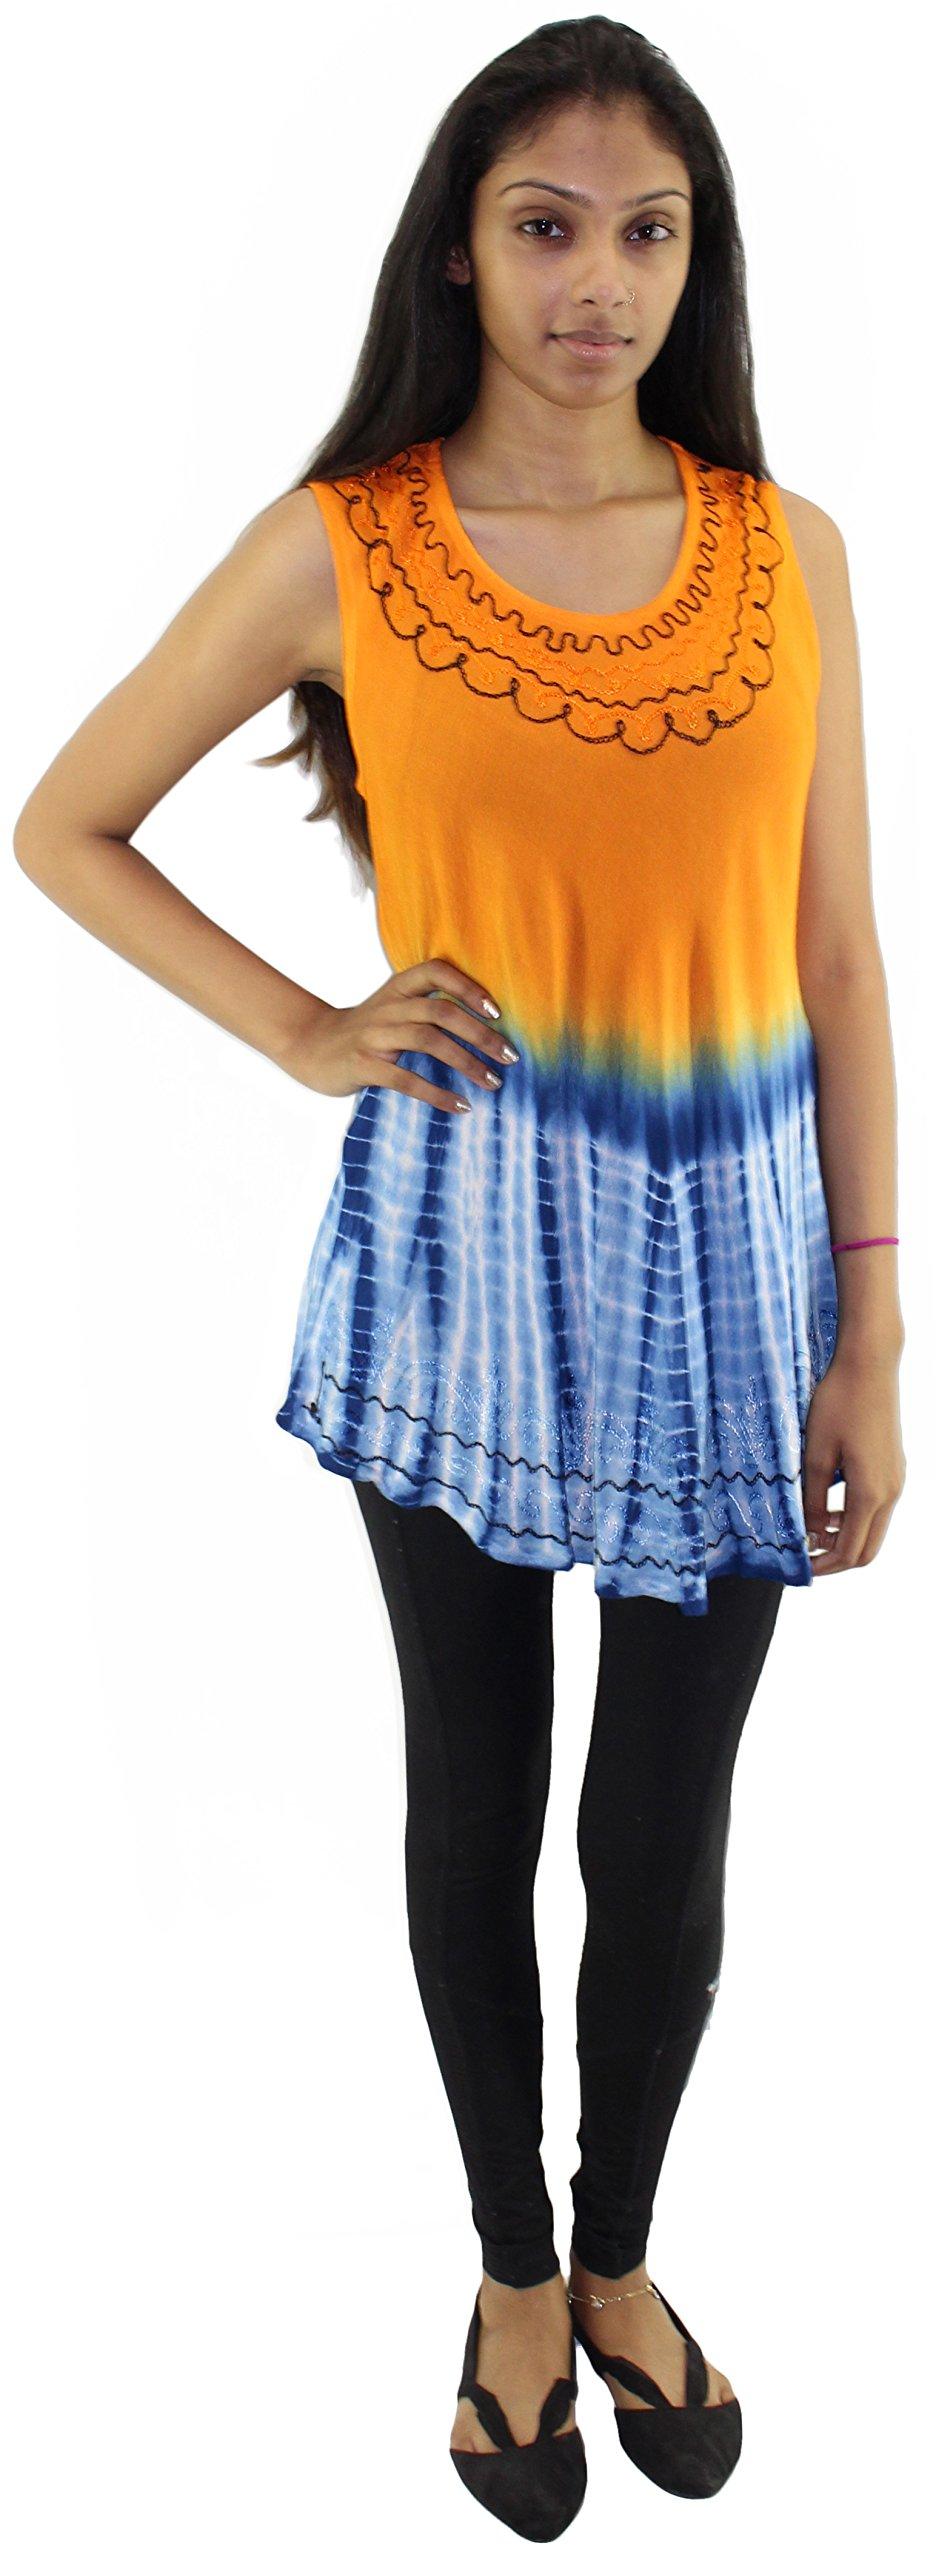 Tye It Up Women's Bohemian Summer Sleeveless Blouse (Orange2)